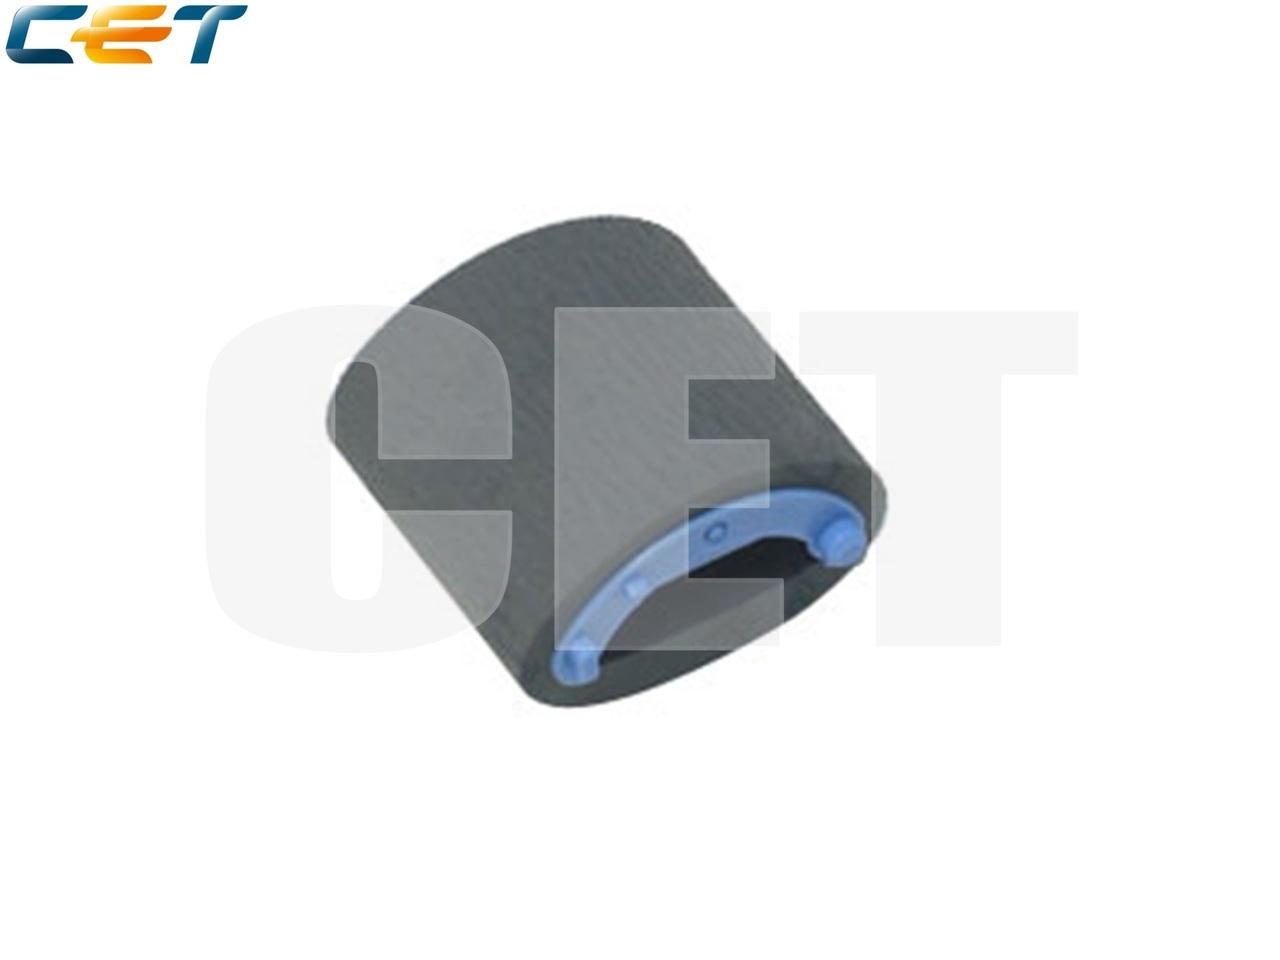 Ролик подхвата RL1-0303-000 для HP LaserJet1000/1200/1150/1300  (CET), CET0392, CET0392R